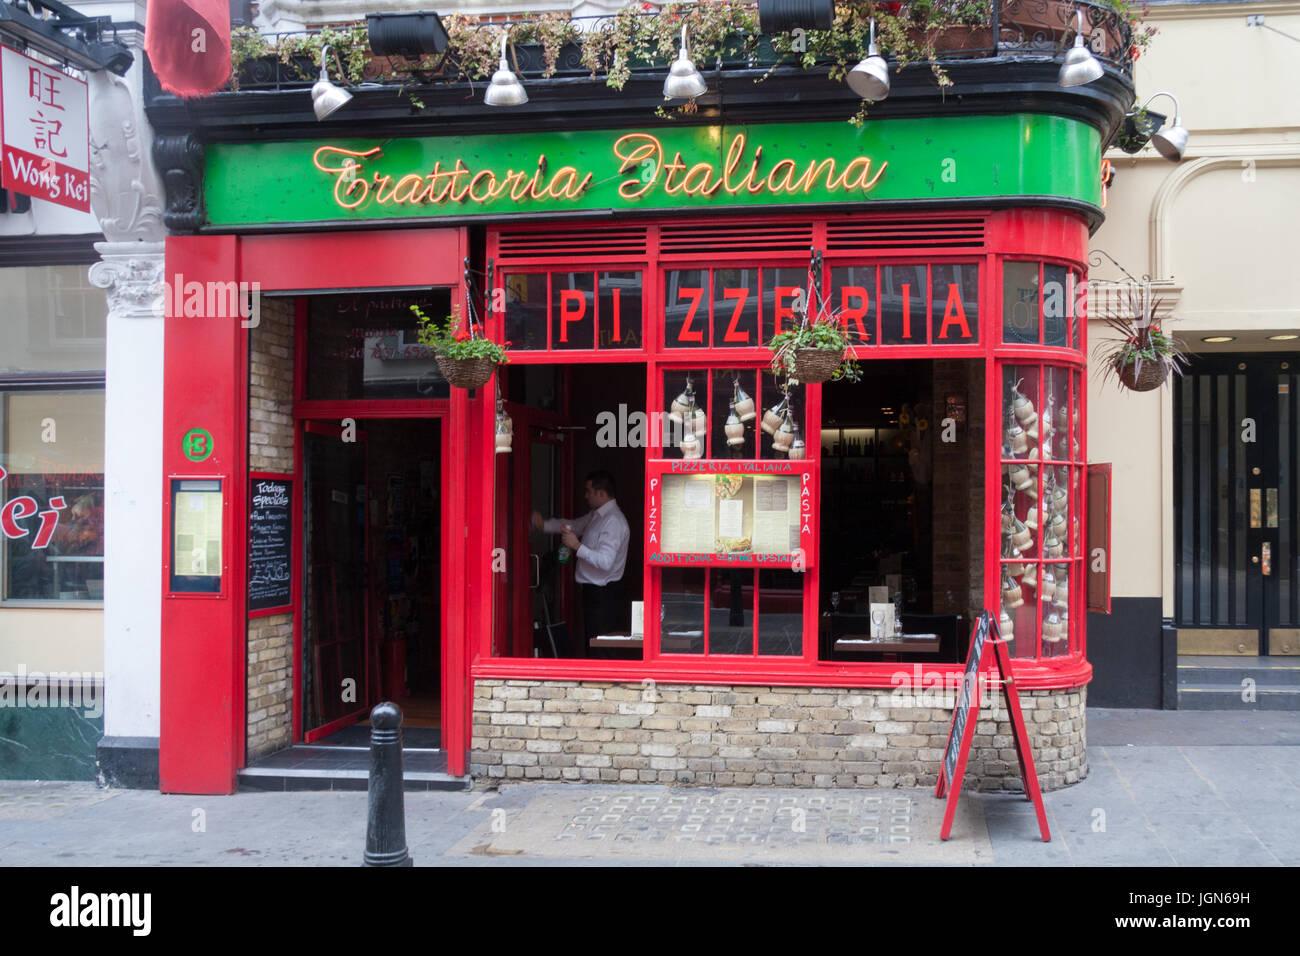 Trattoria Italiana Italian restaurant, Wardour street, Chinatown, London, England, United Kingdom - Stock Image